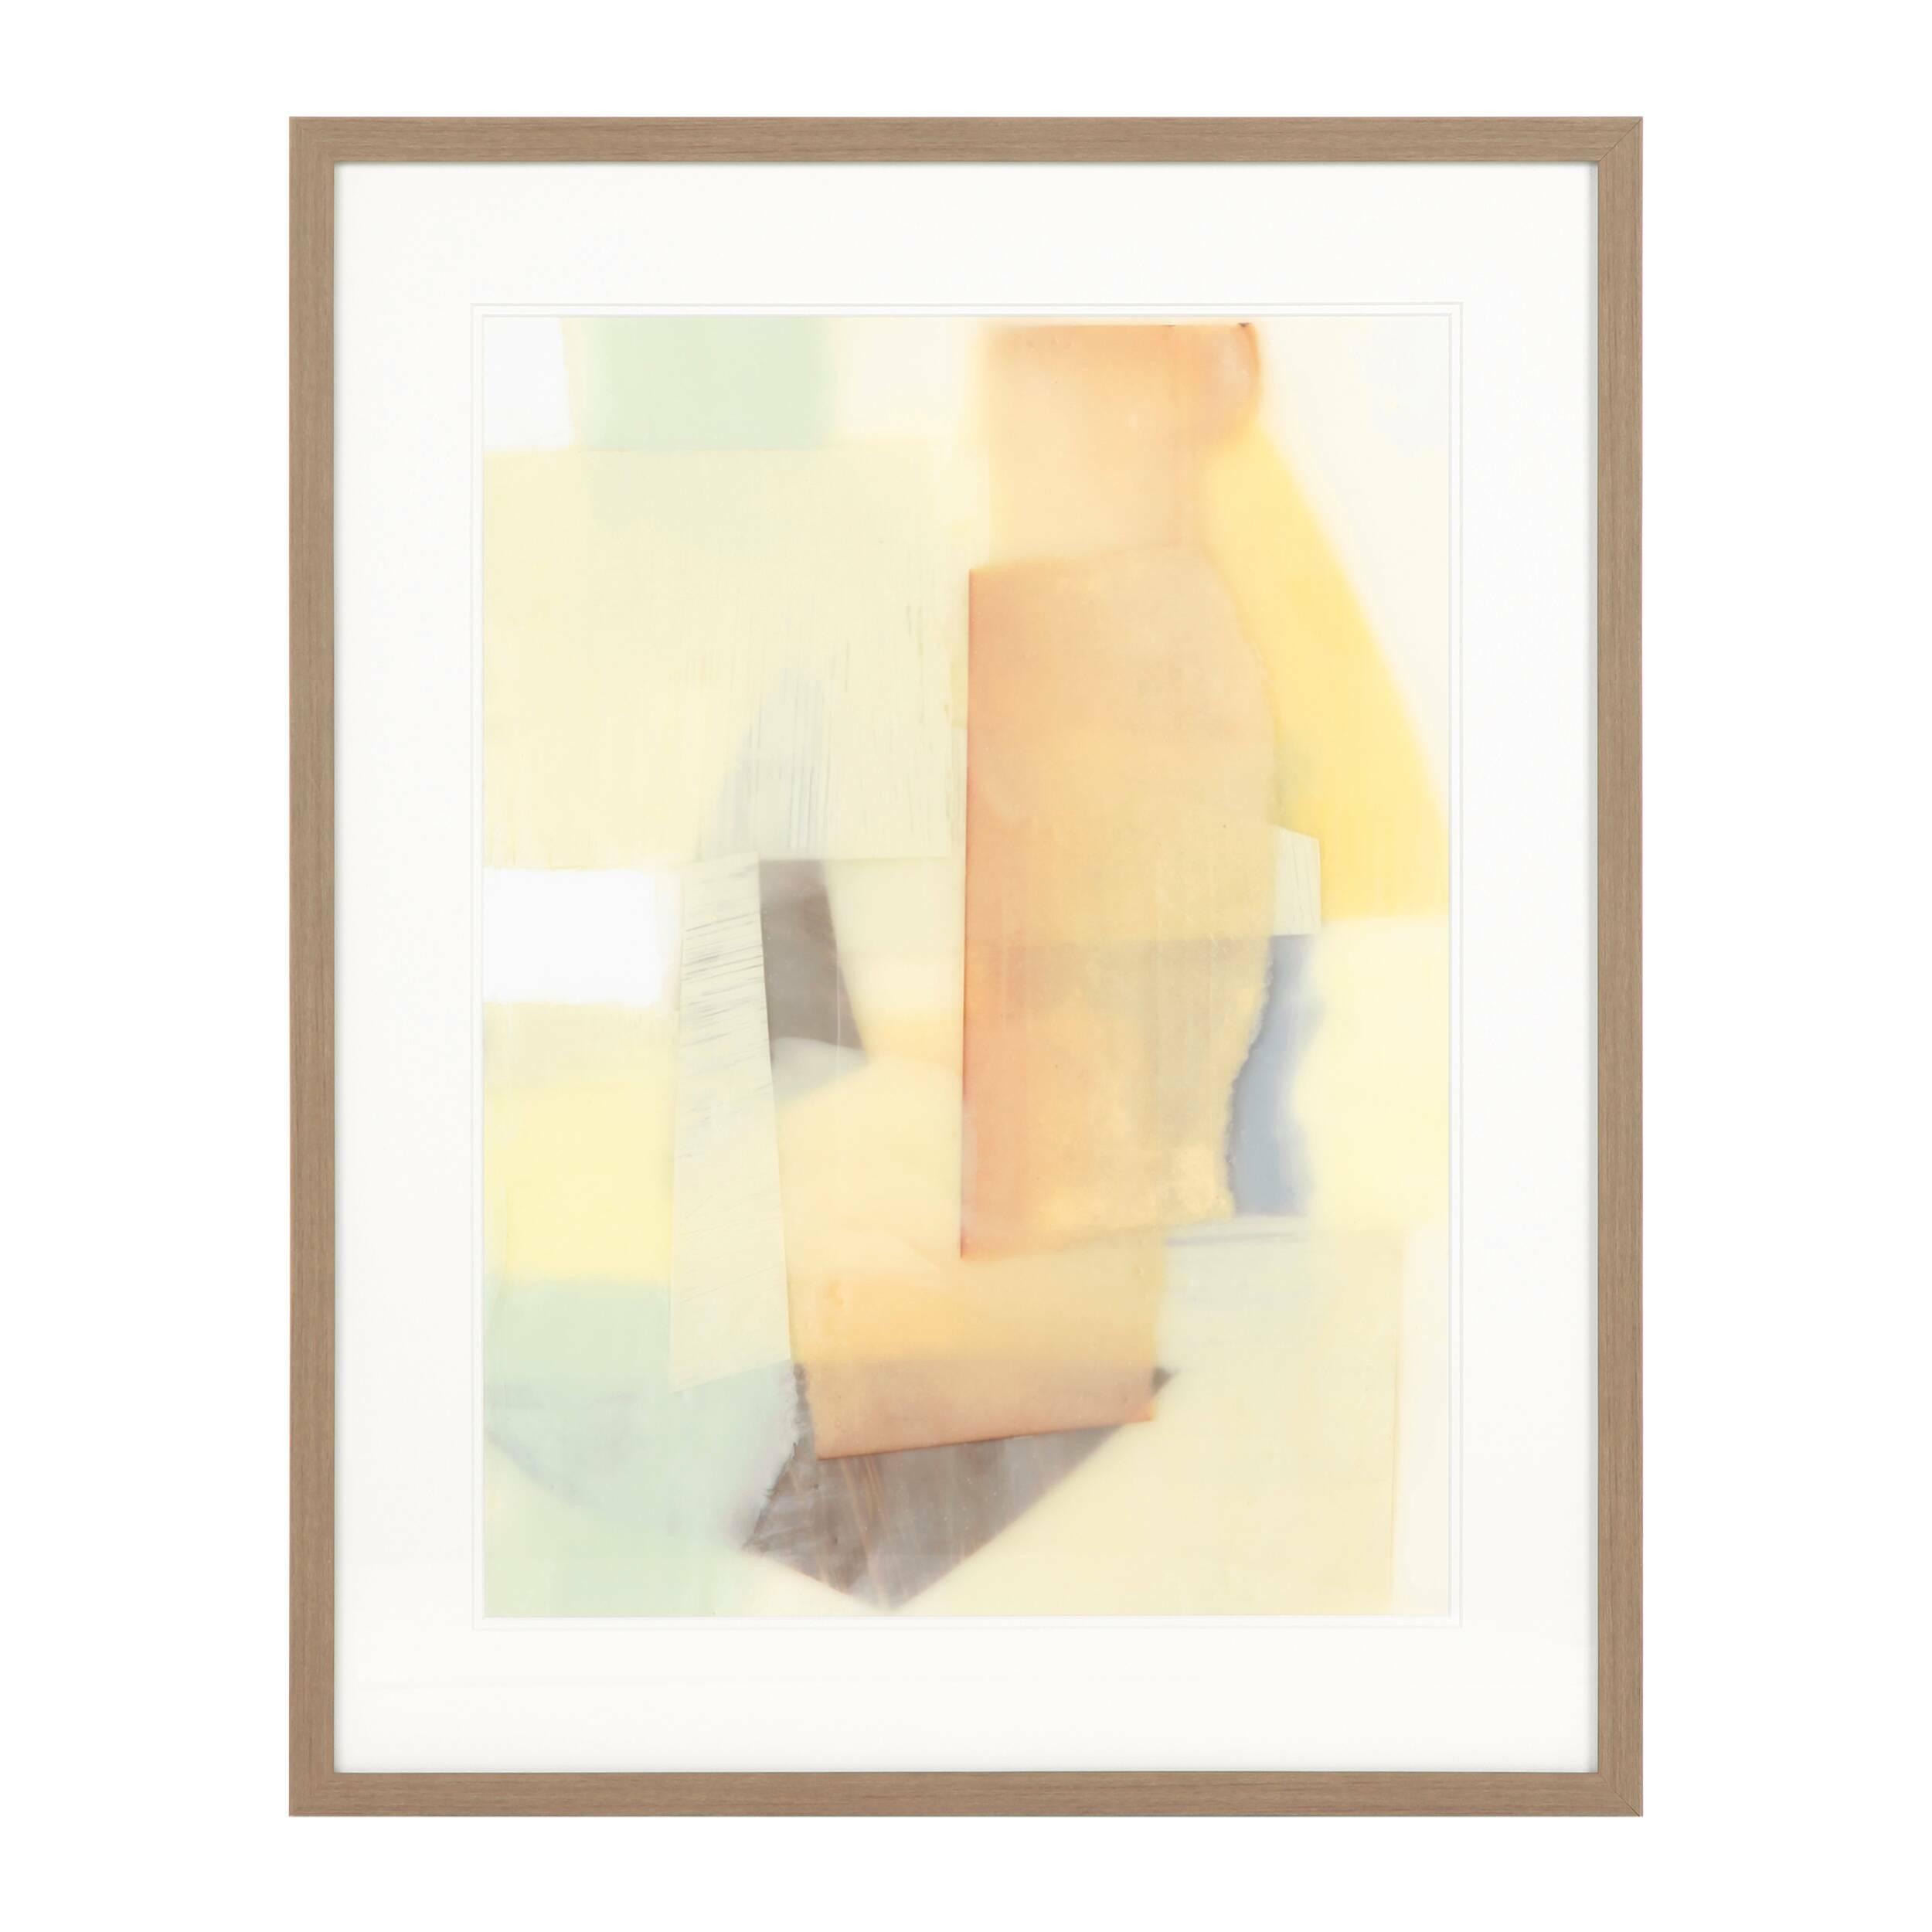 Постер Seated WomanКартины<br><br><br>stock: 4<br>Ширина: 61,2<br>Цвет: Разноцветный<br>Длина: 77,2